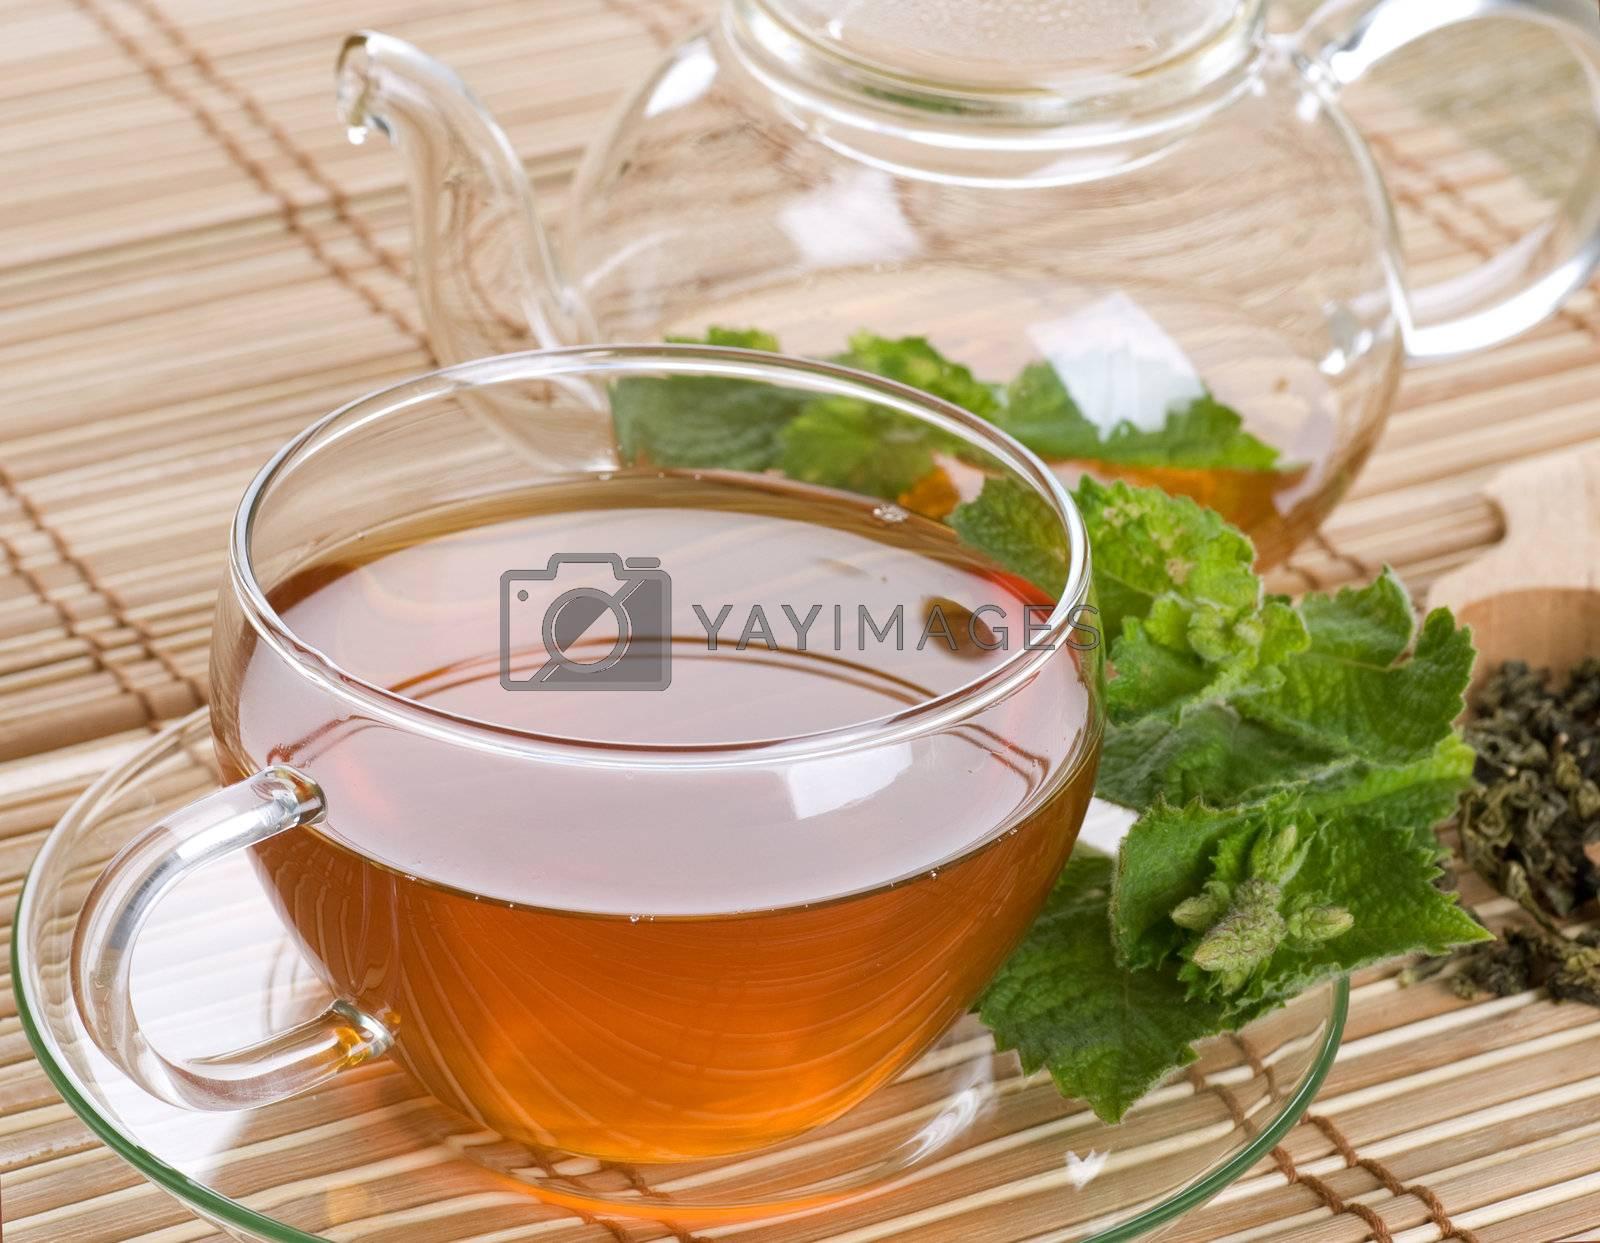 Healthy Tea With Mint  by Subbotina Anna